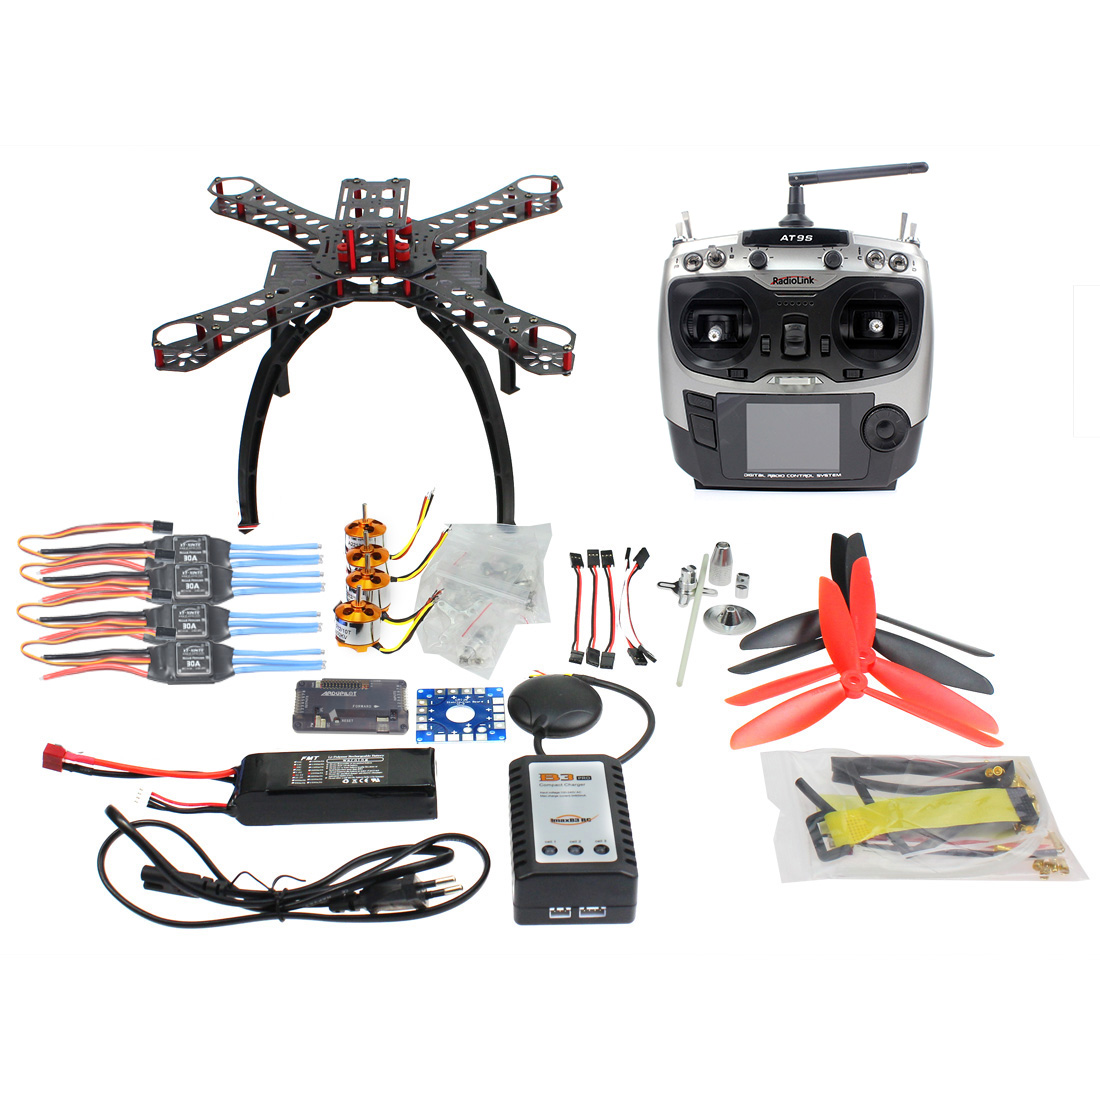 F14891-C RC Fiberglass Frame Multicopter Full Kit DIY GPS Drone FPV Radiolink AT9 Transmitter APM2.8 1400KV Motor 30A ESC diy rc multicopter fpv apm2 8 gps drone x4m310l fiberglass frame kit 1400kv motor xt xinte 30a esc propeller f14891 a